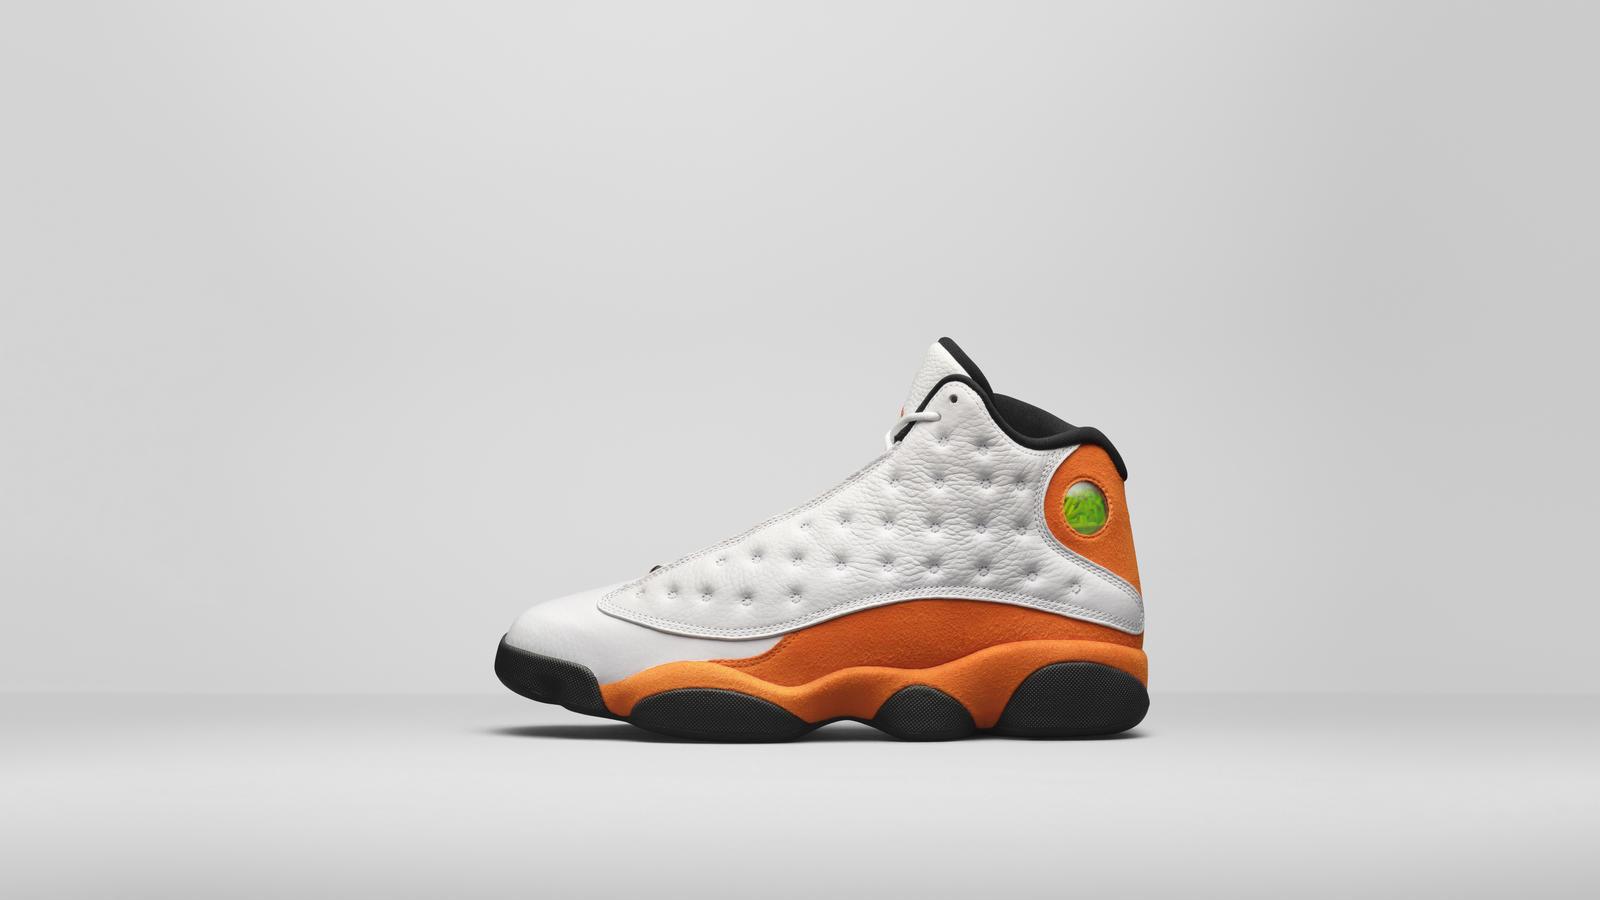 Jordan Brand Spring 2021 Retro Releases 9